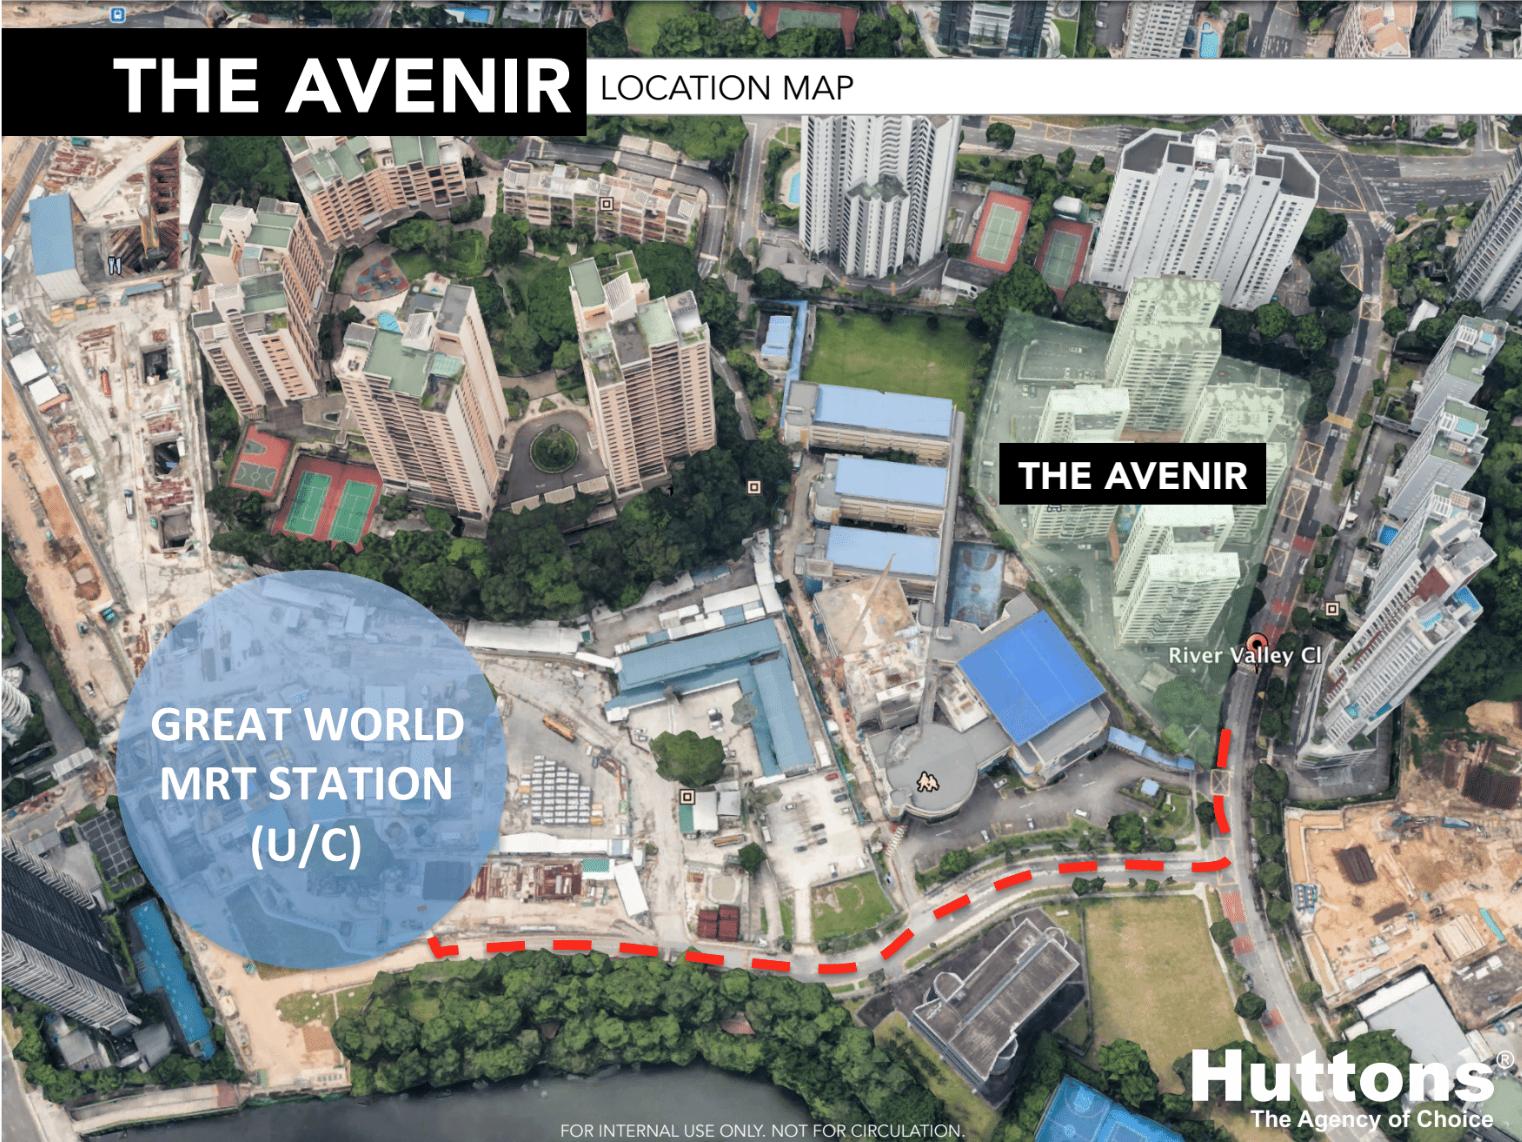 the avenir location map